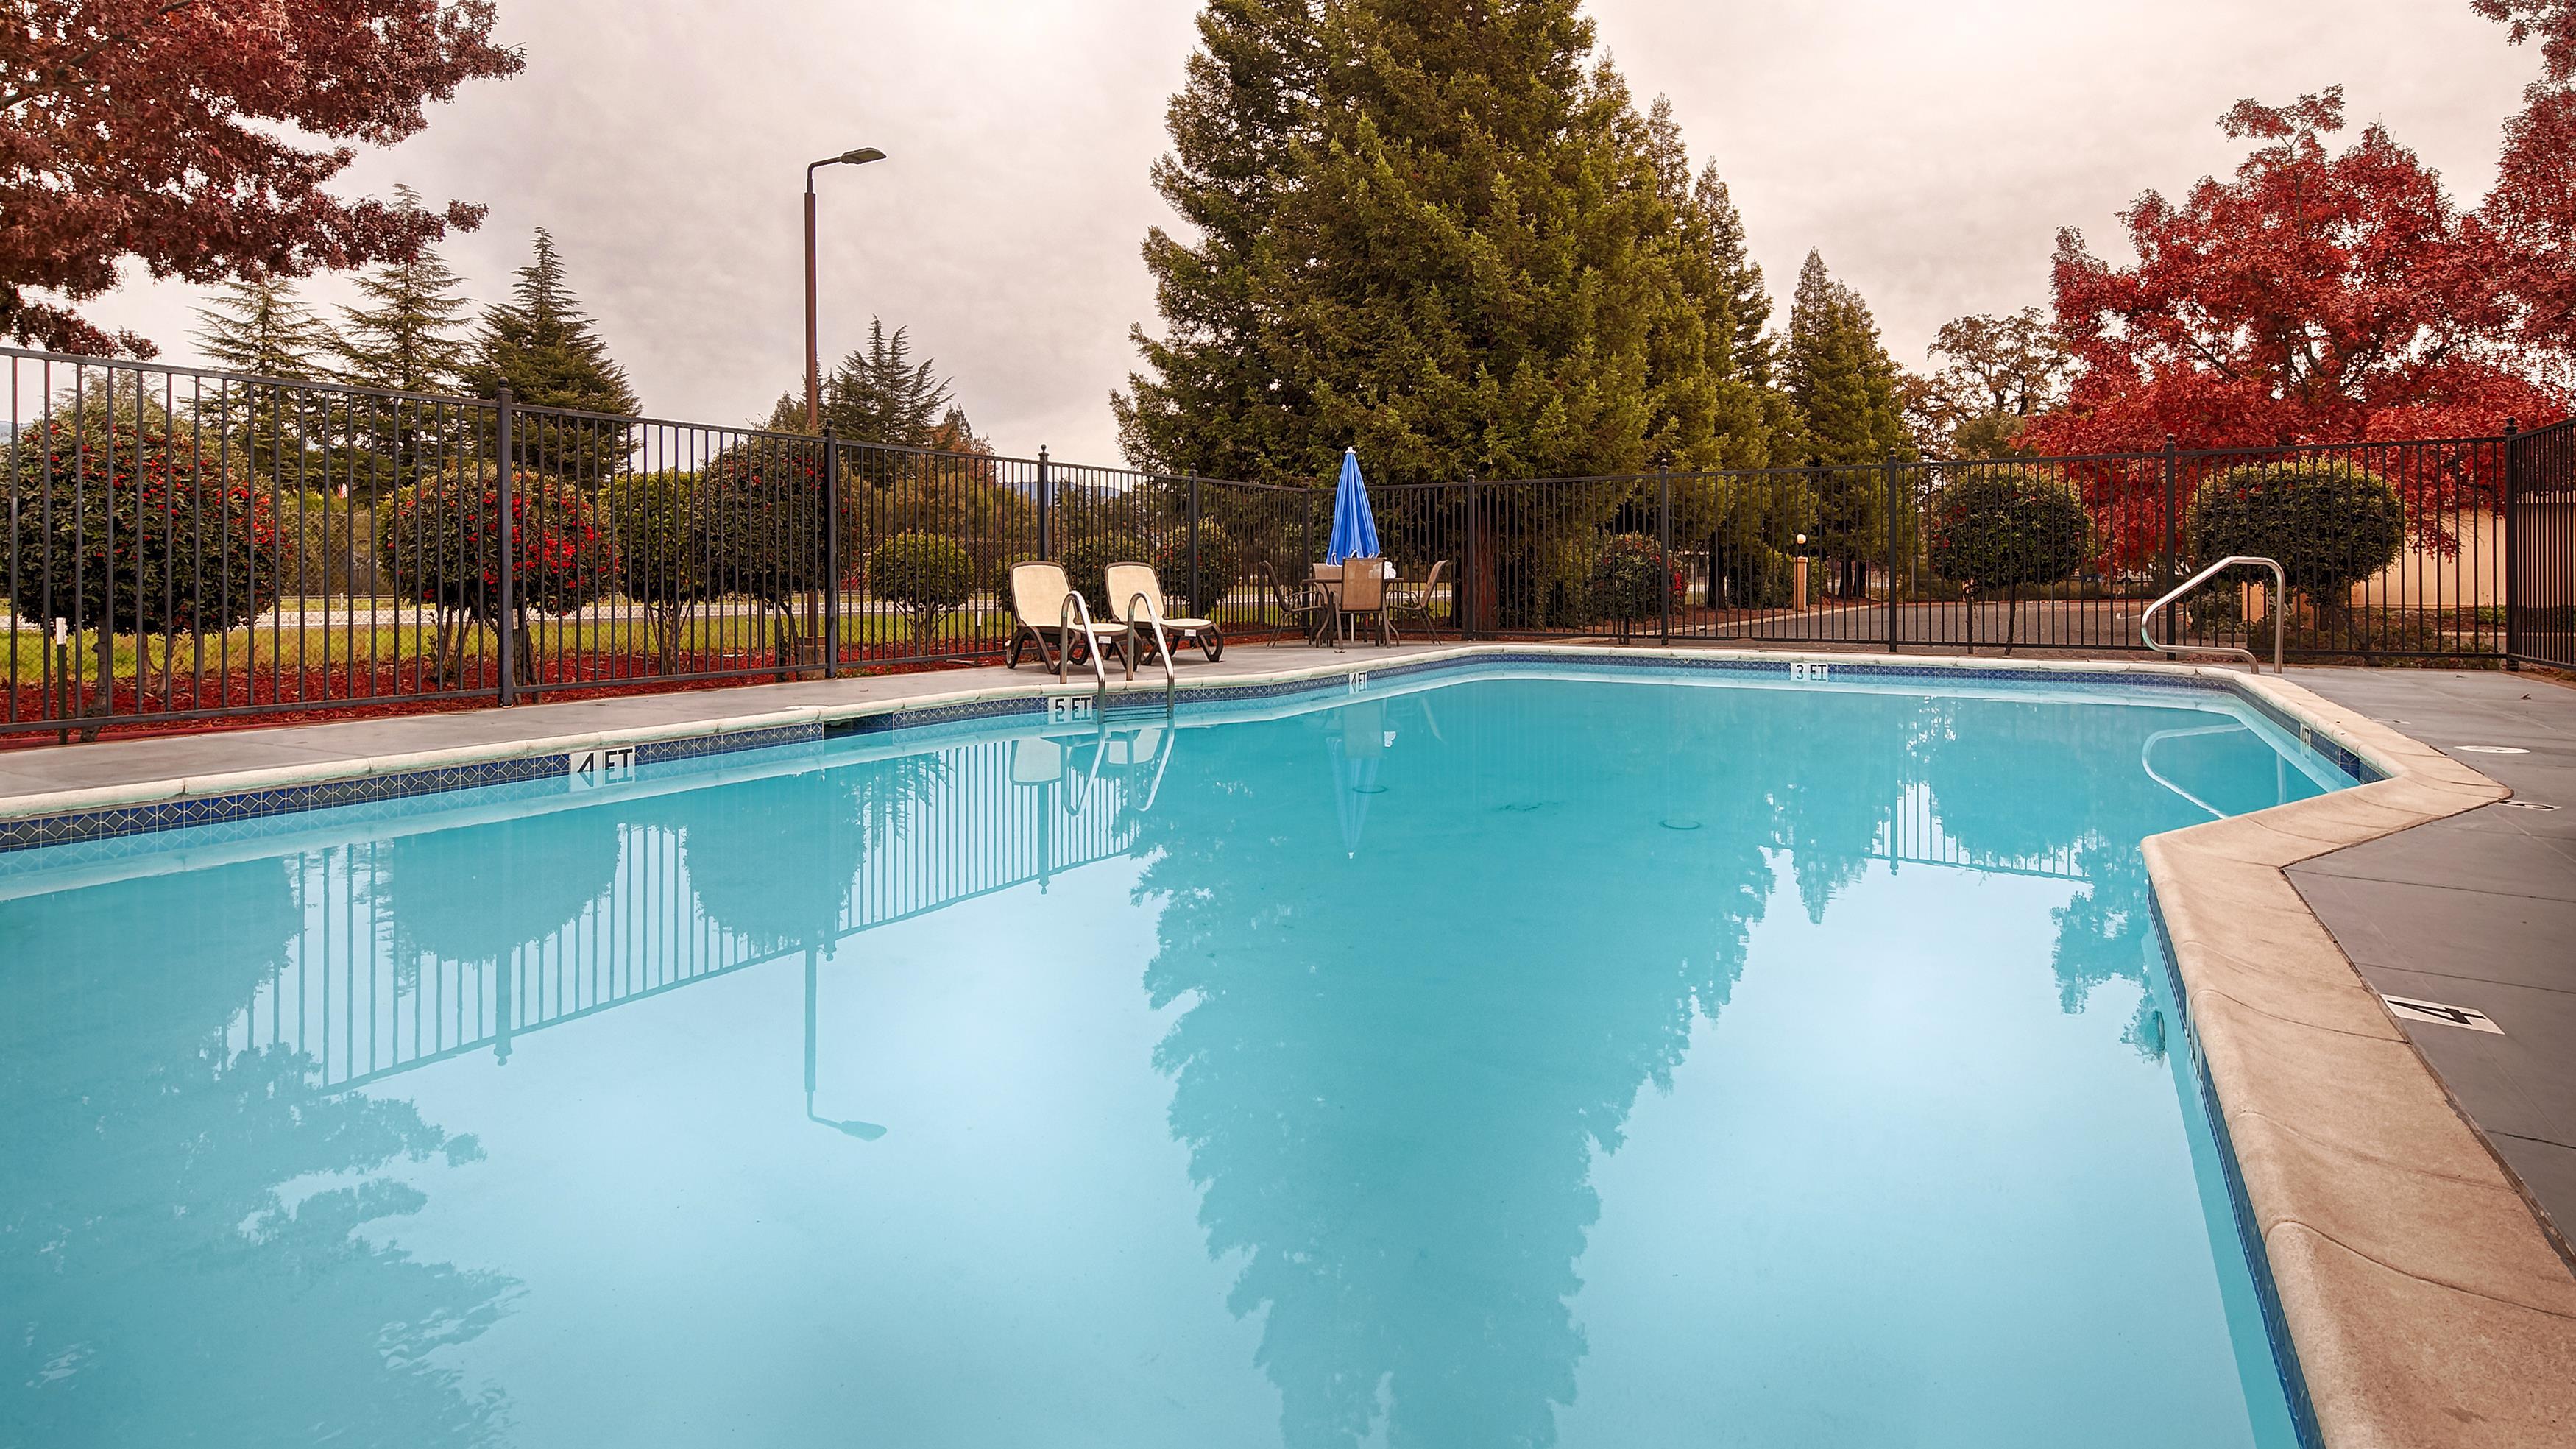 Best Western Orchard Inn, Ukiah CA